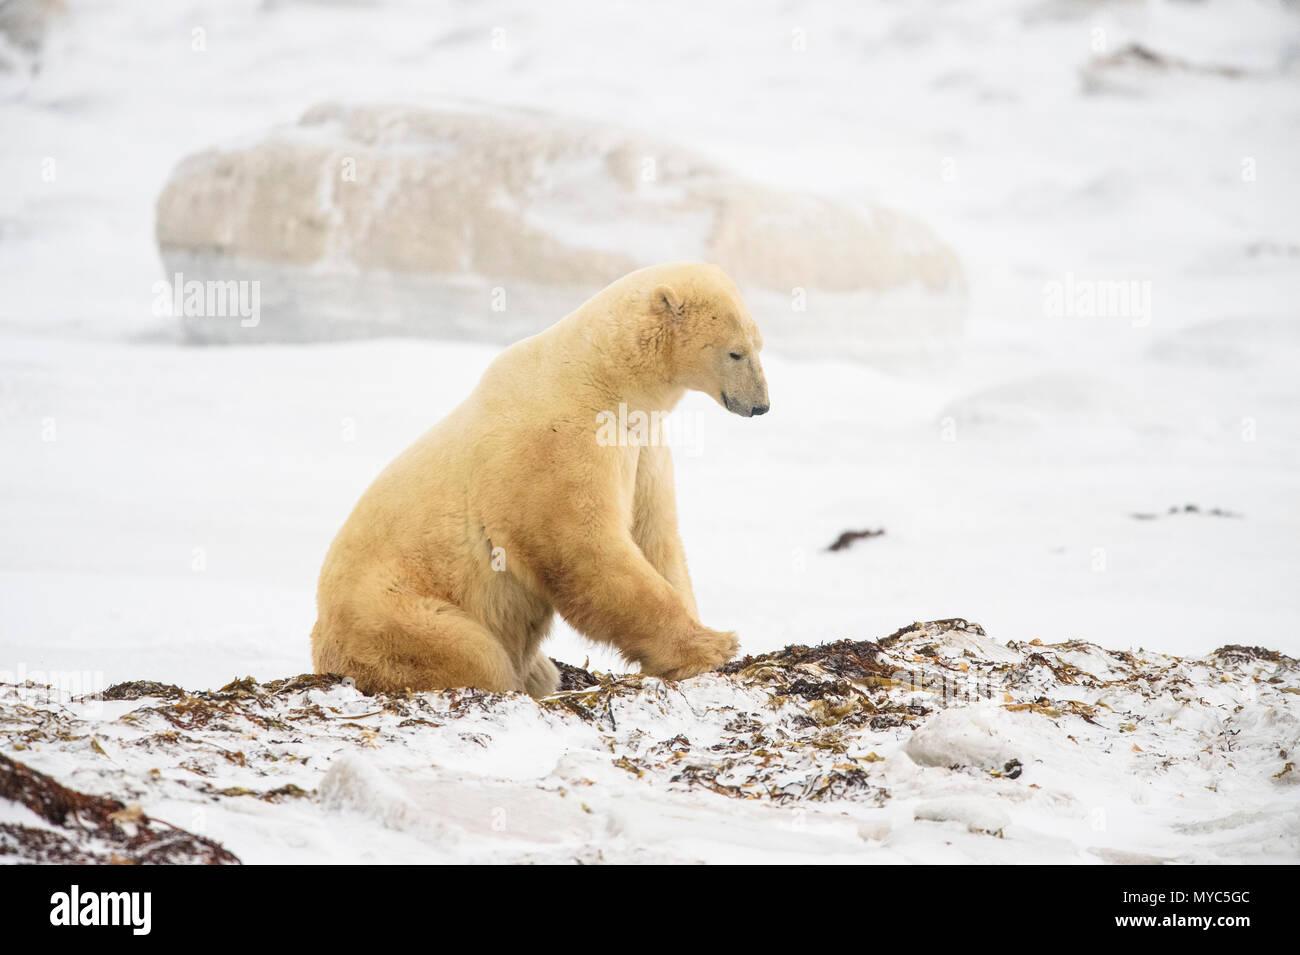 Eisbär (Ursus maritimus) Aushub Tag Bett in Seetang, Wapusk NP, Cape Churchill, Manitoba, Kanada Stockbild